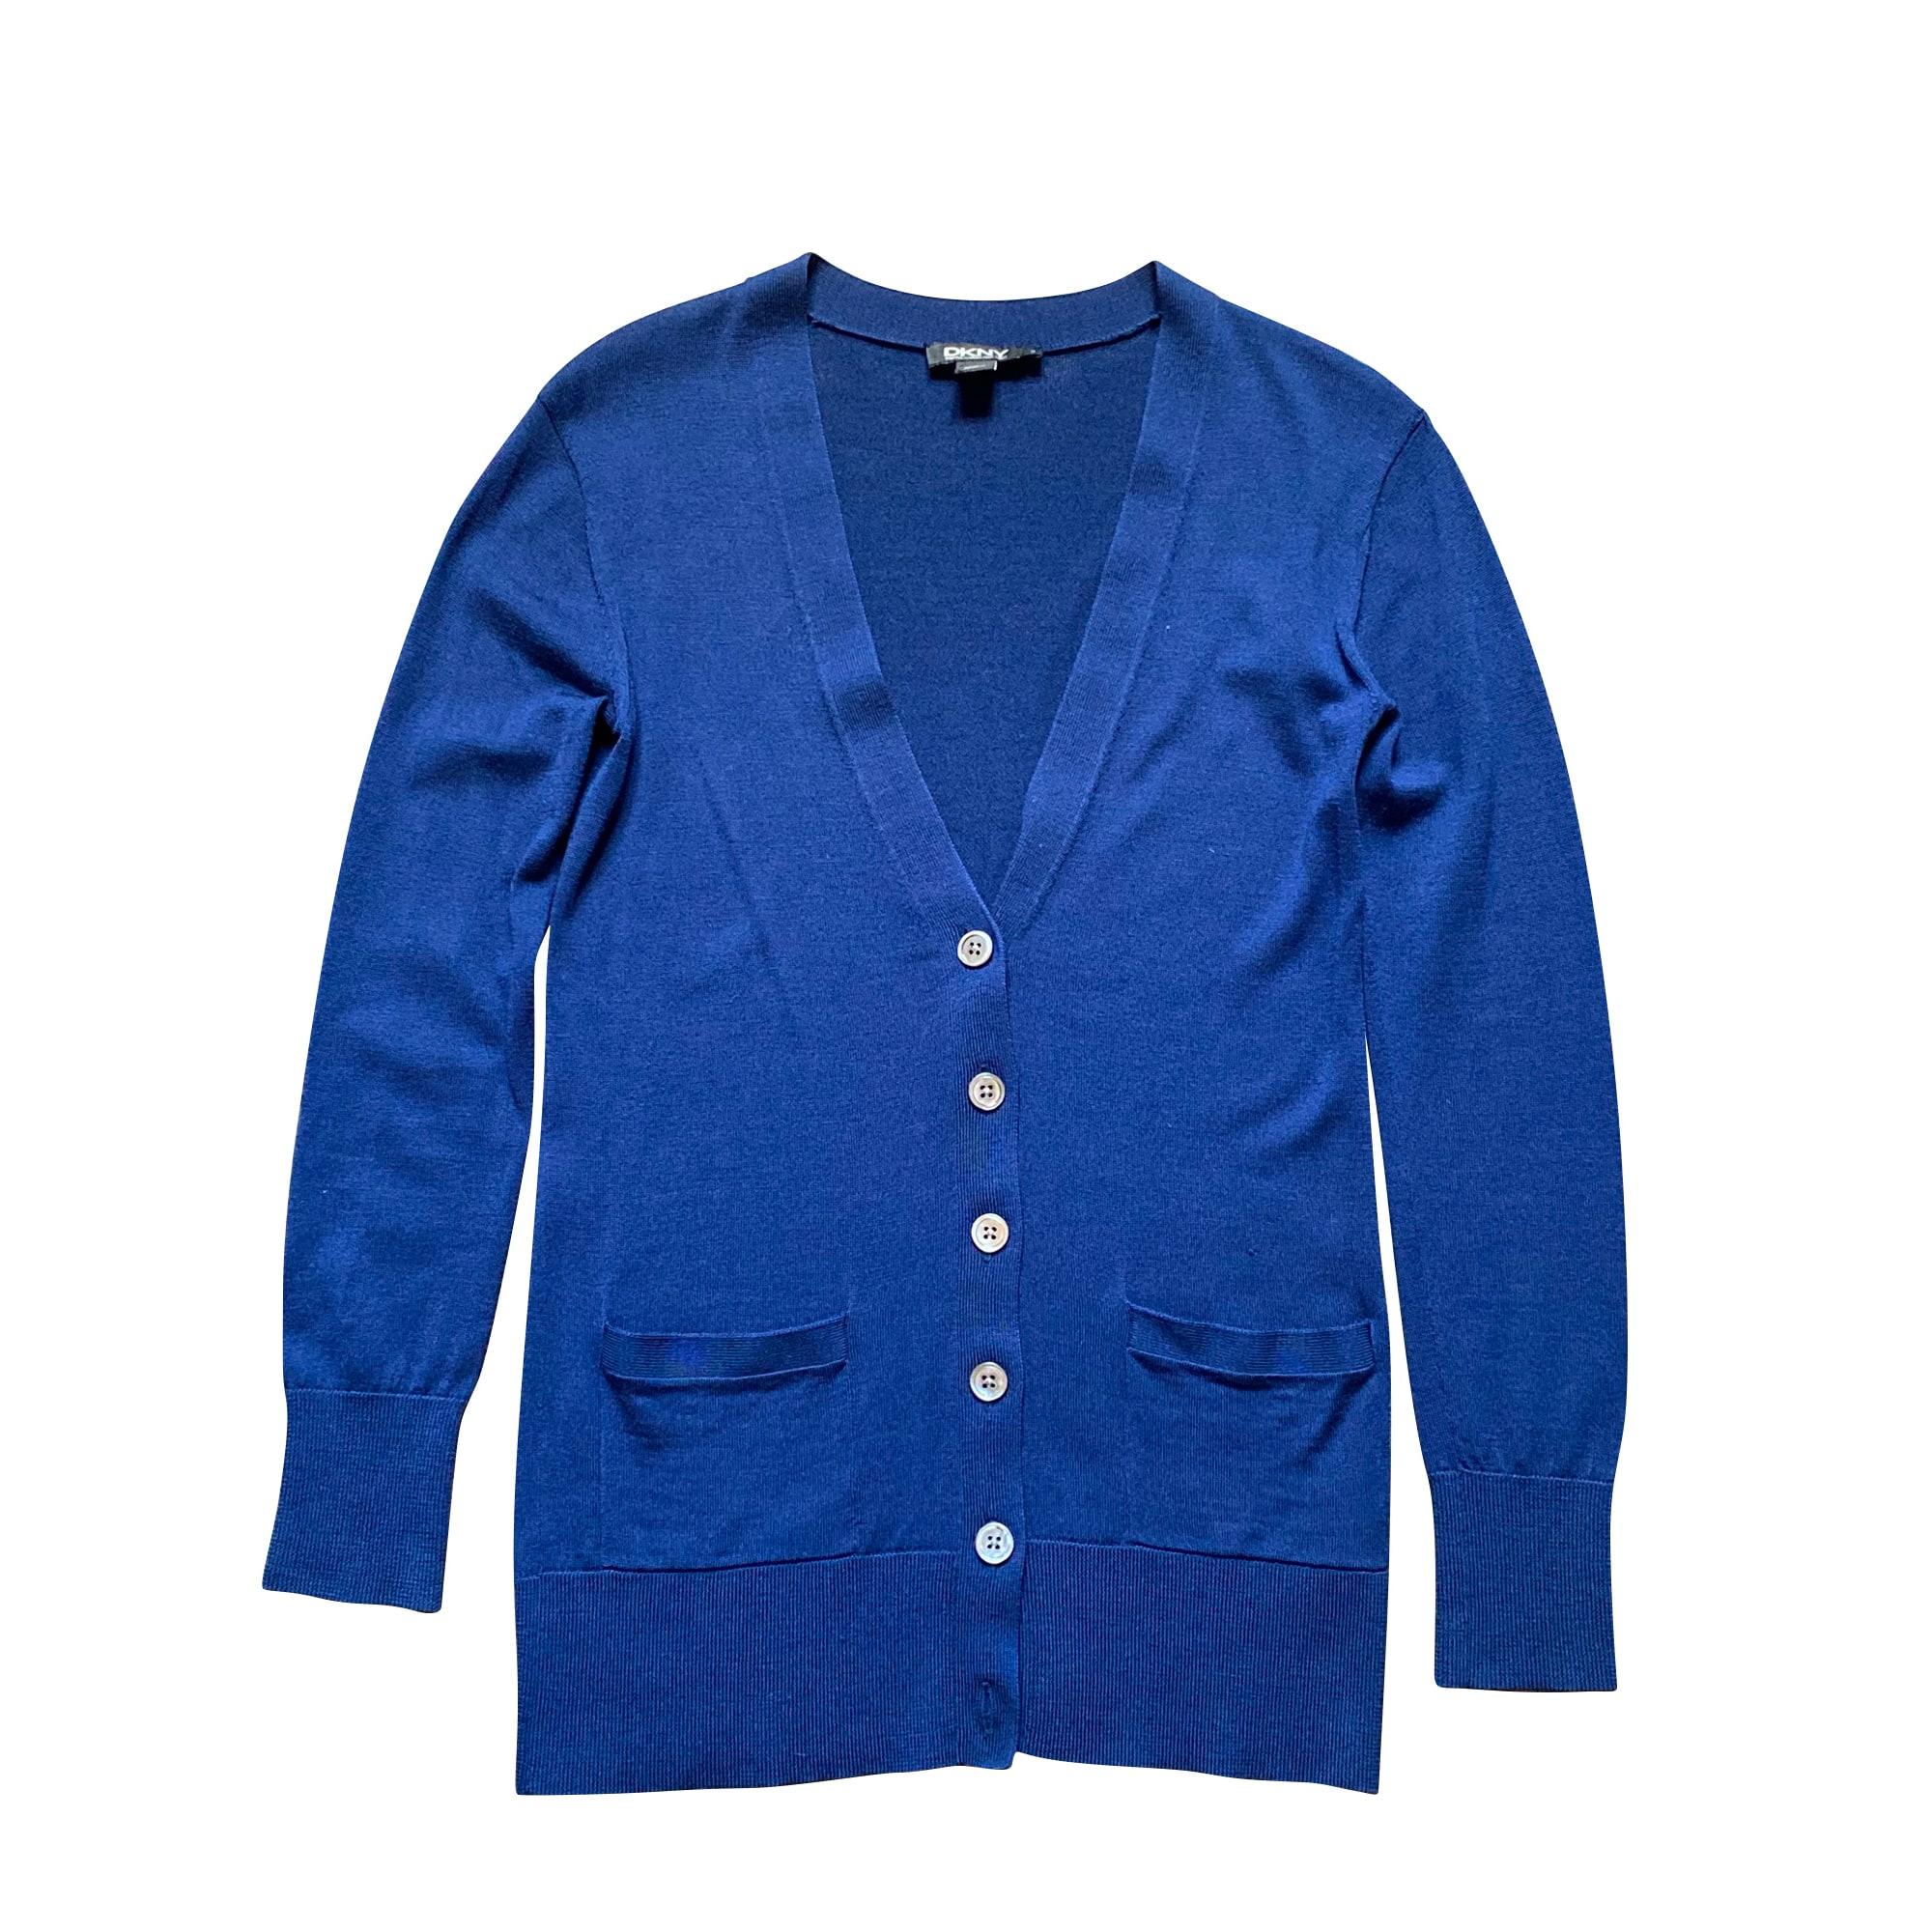 Gilet, cardigan DKNY Bleu, bleu marine, bleu turquoise